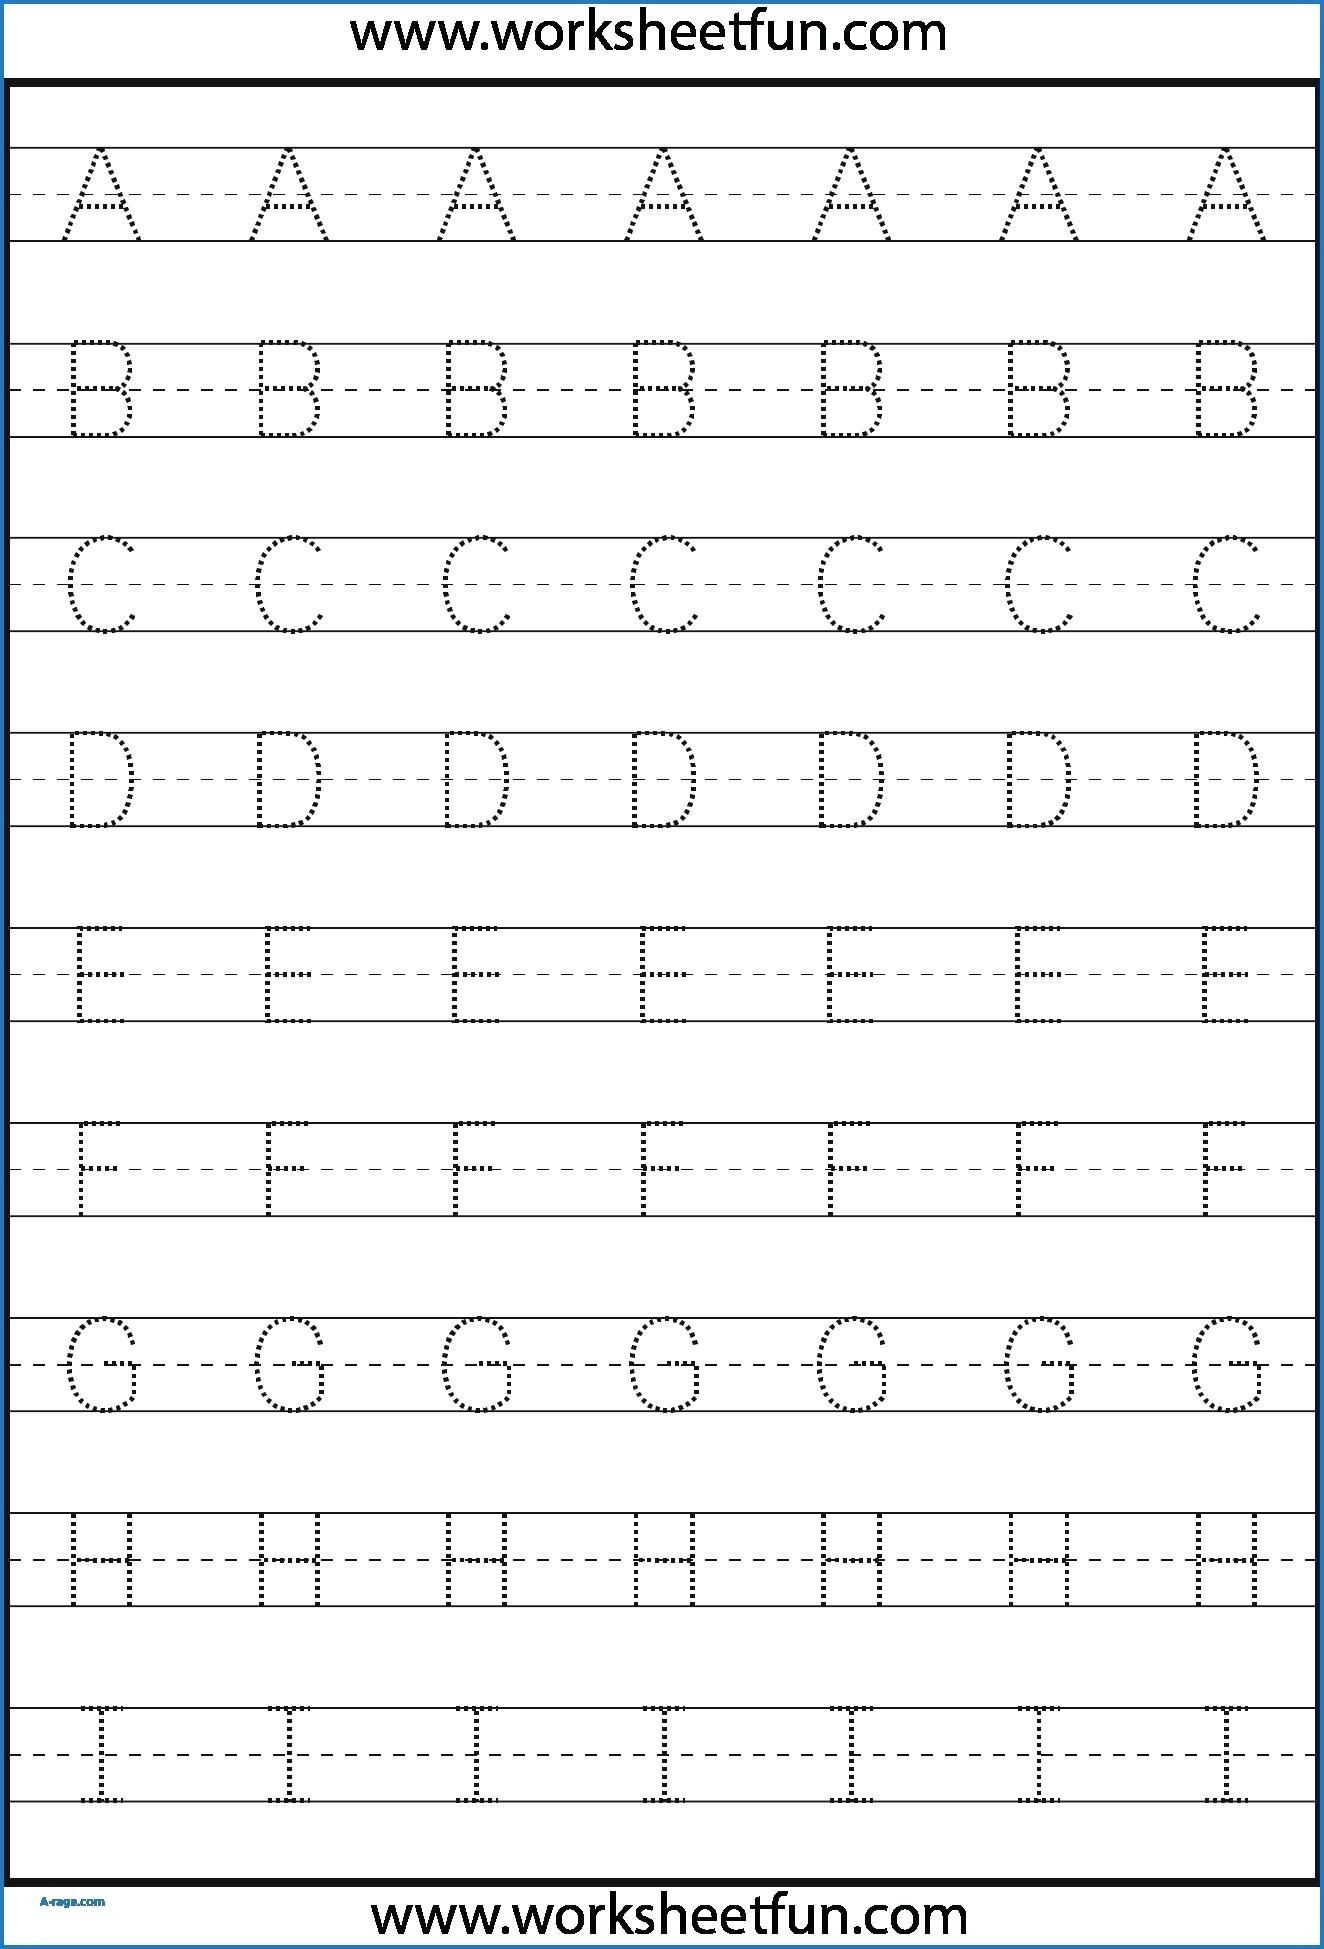 Kindergarten Letter Tracing Worksheets Pdf - Wallpaper Image within How To Make Tracing Letters Worksheet